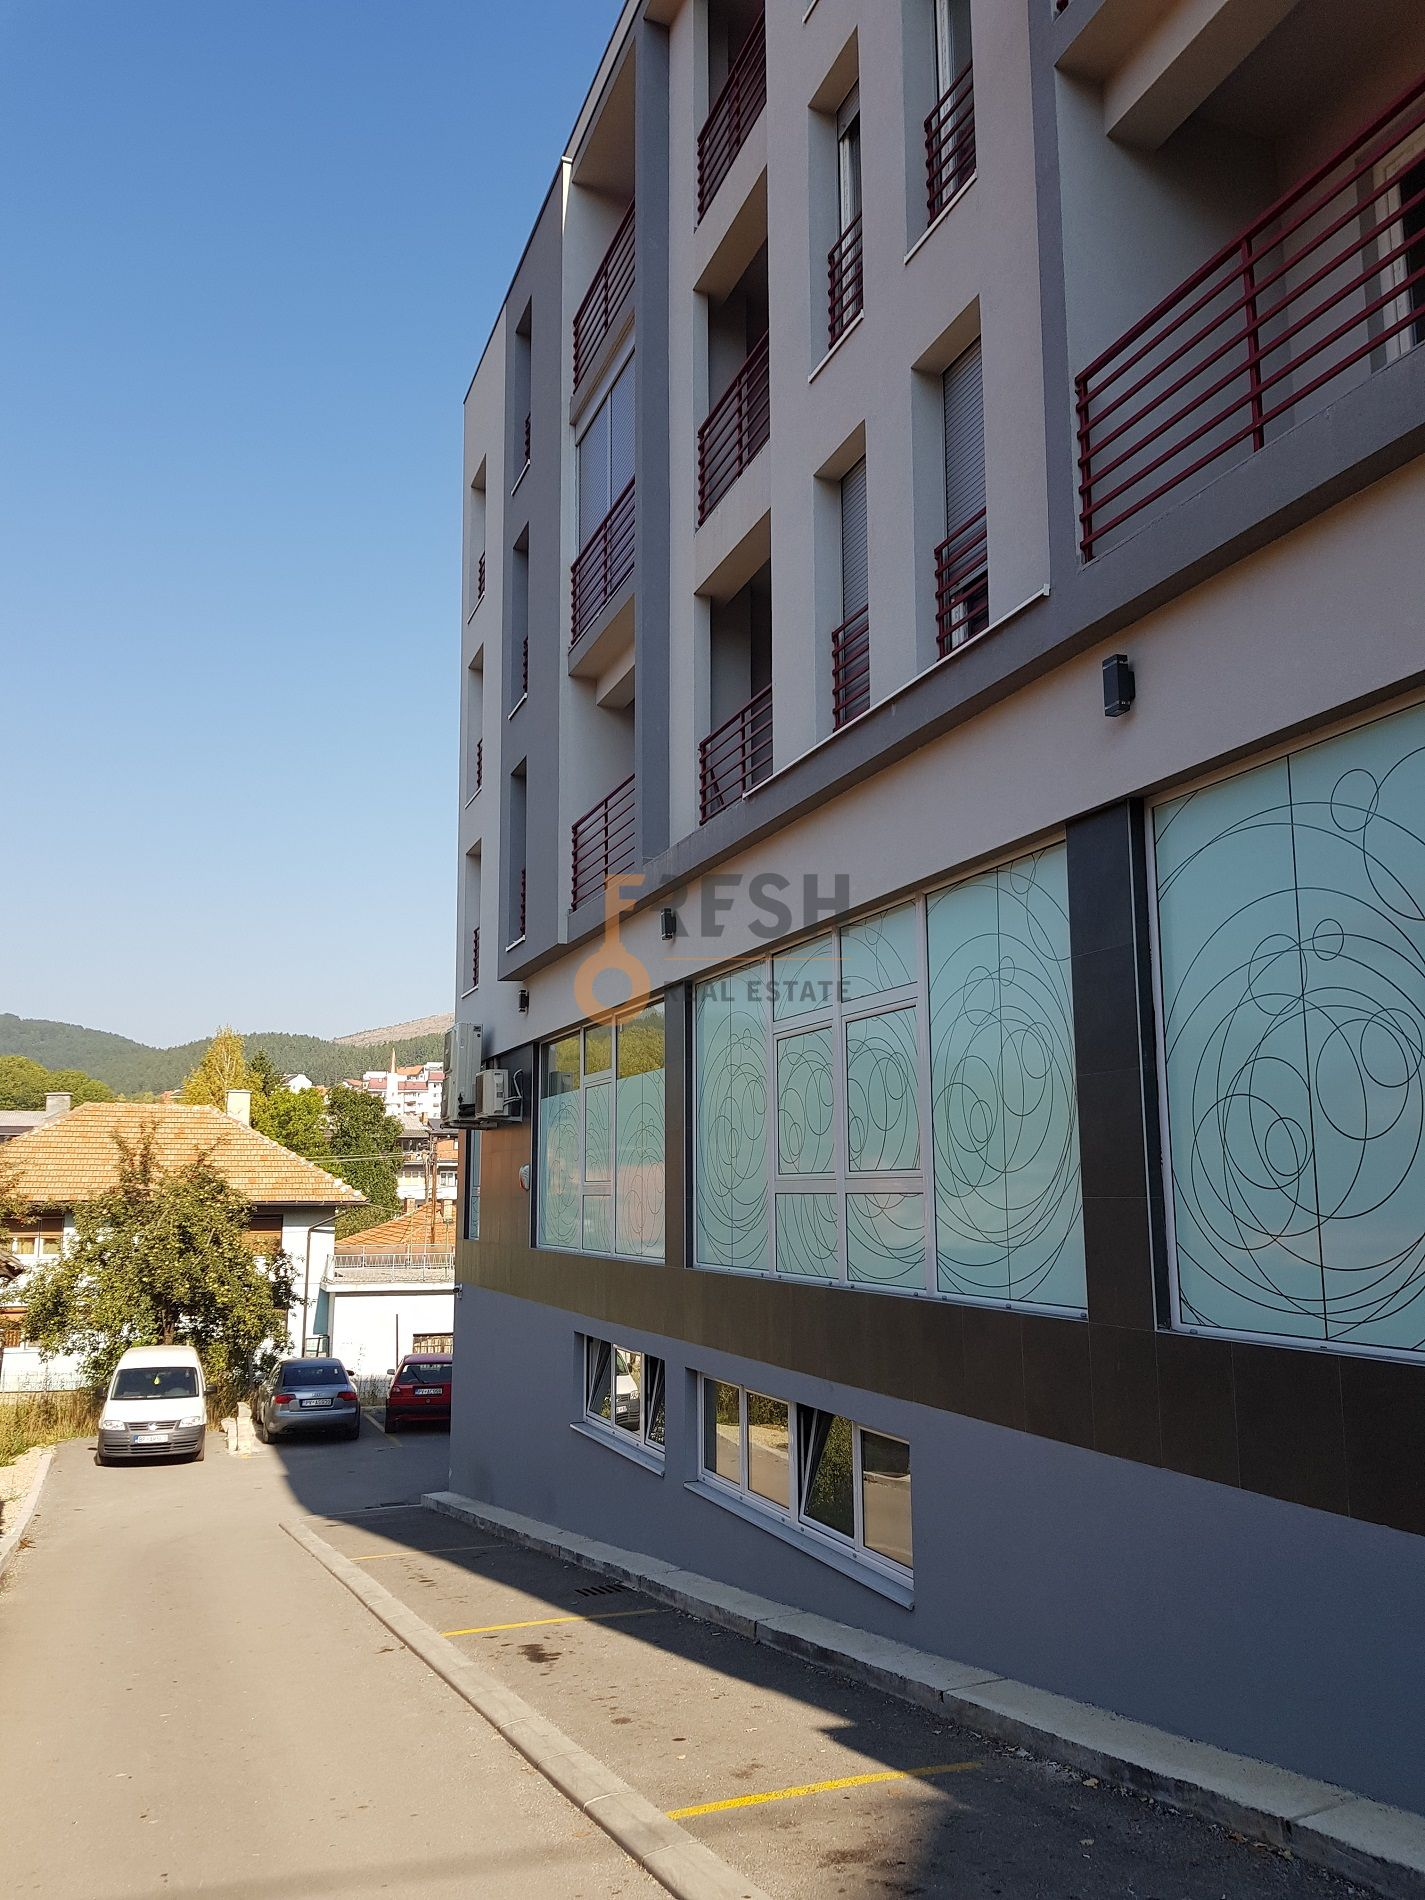 Jednosoban stan, 46m2, Centar, Pljevlja, Prodaja - 1